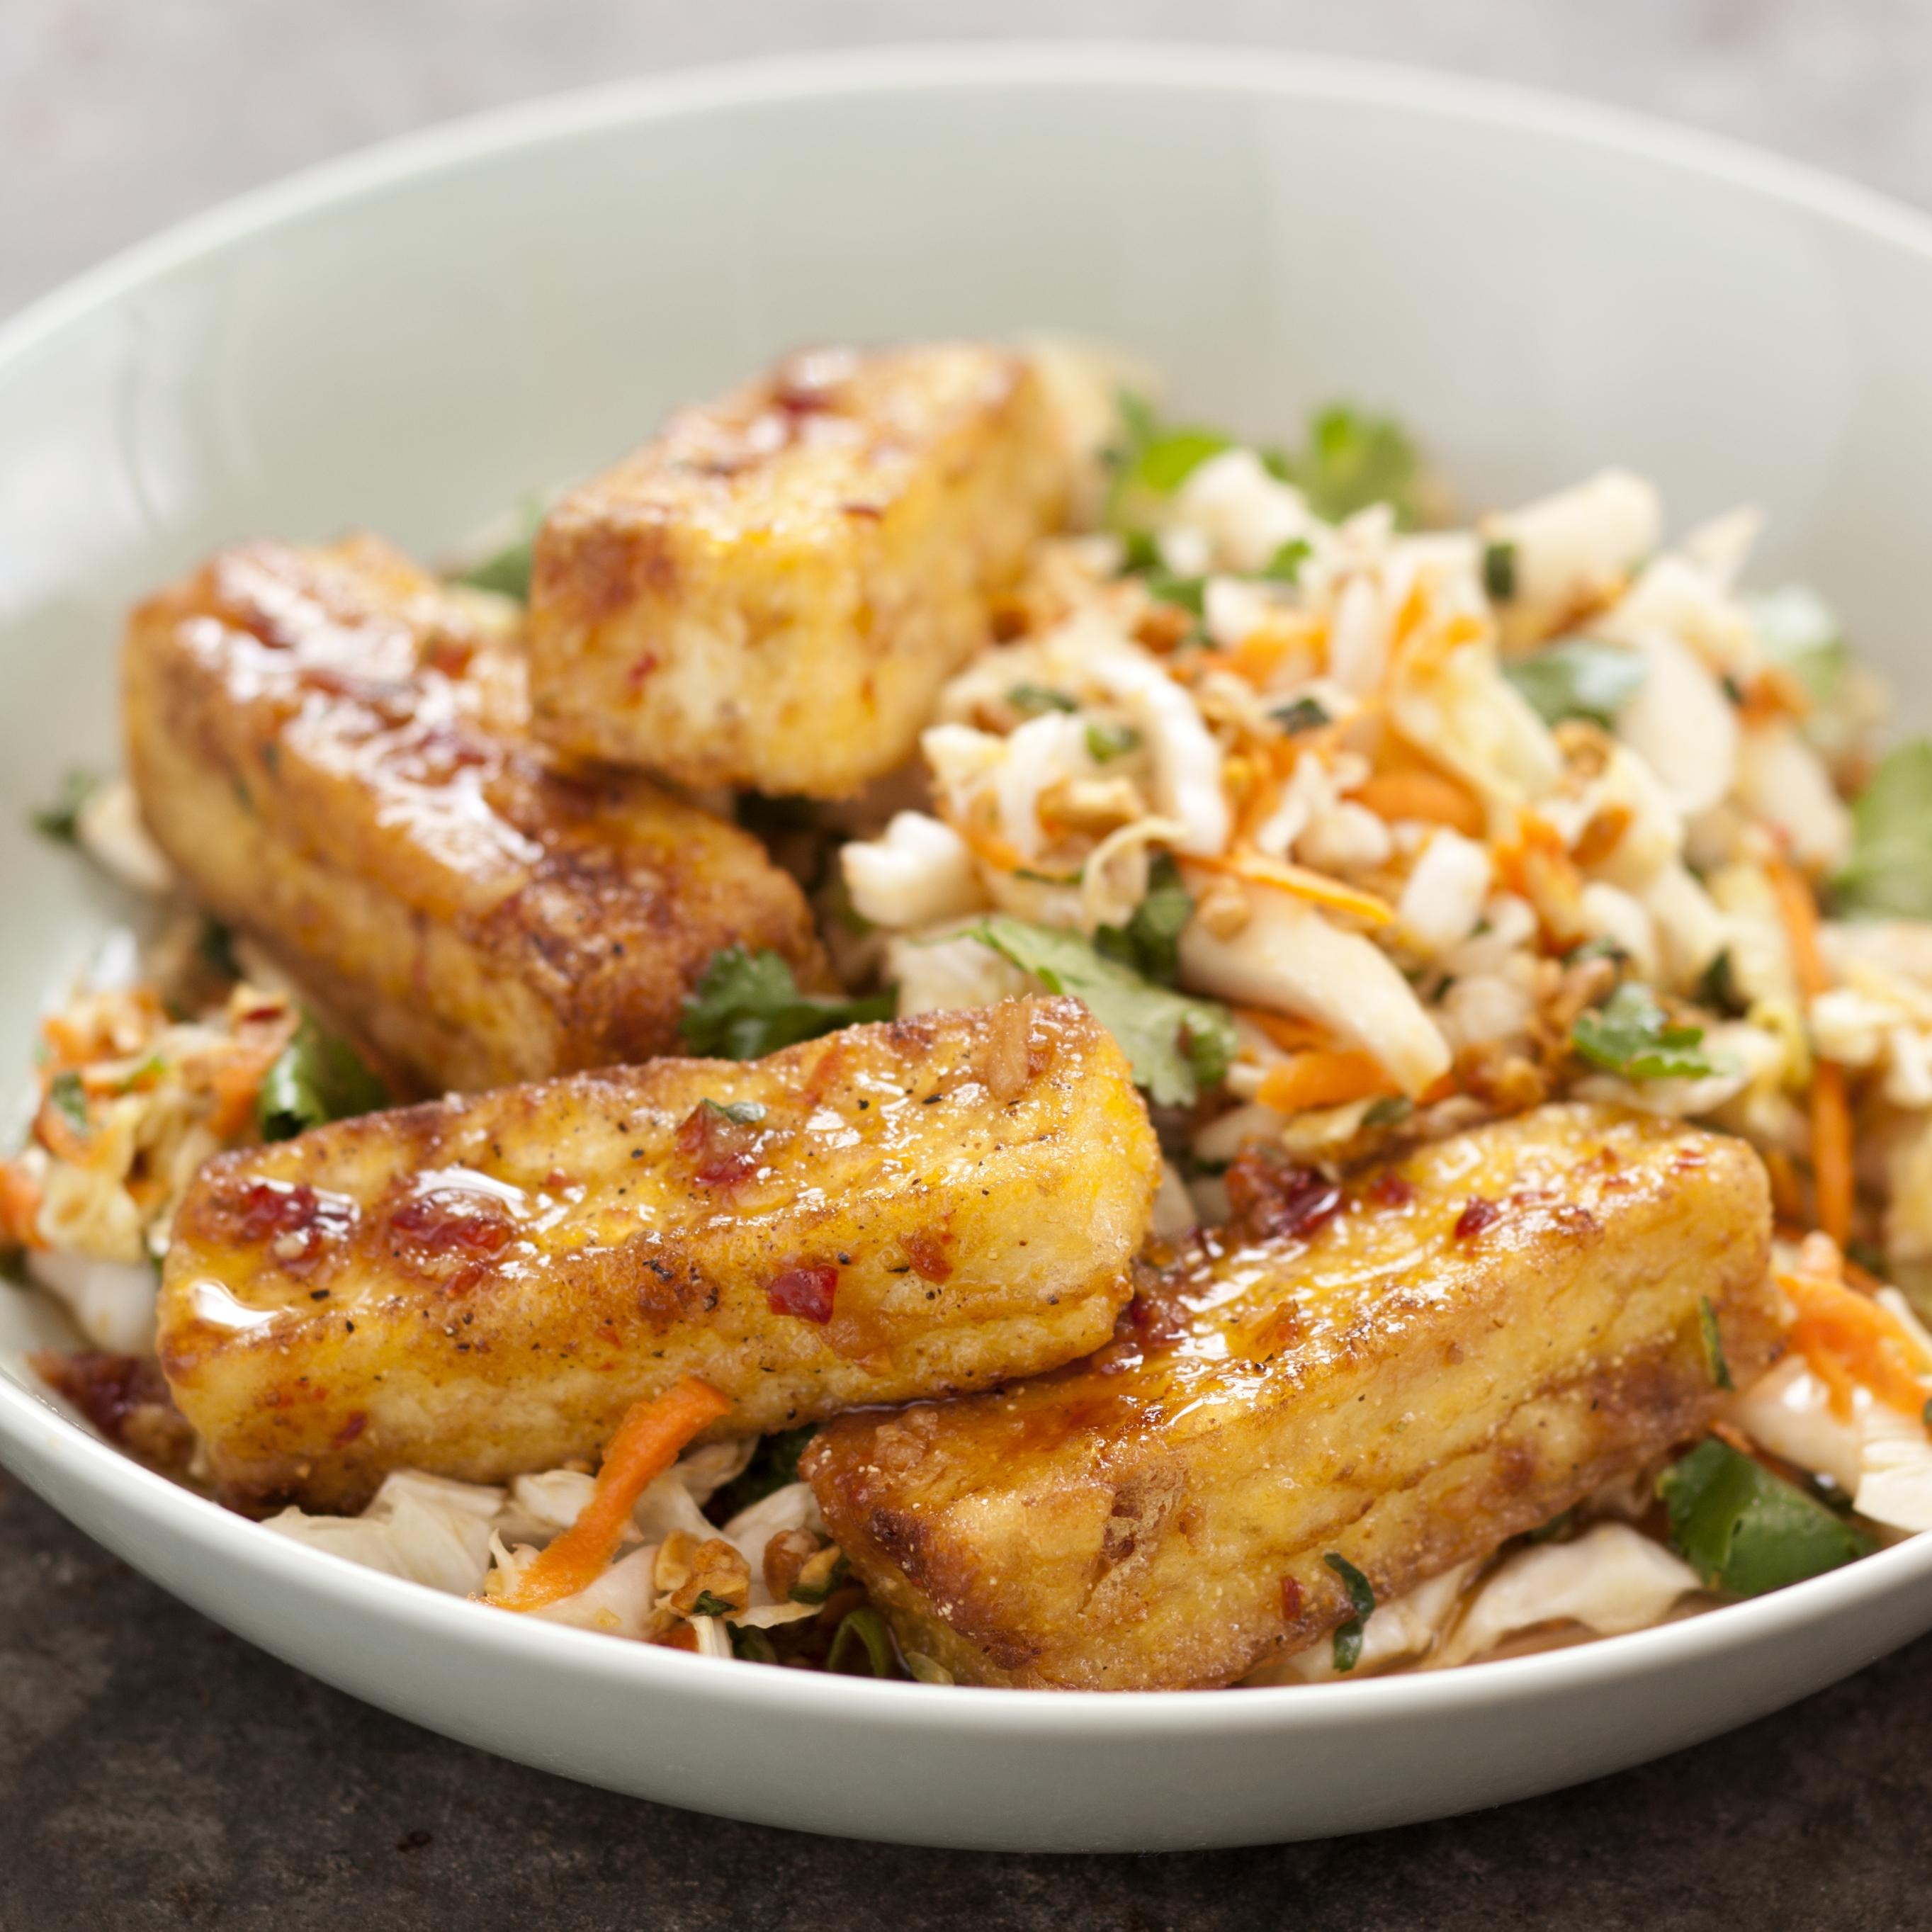 Warm Cabbage Salad with Crispy Tofu | America's Test Kitchen